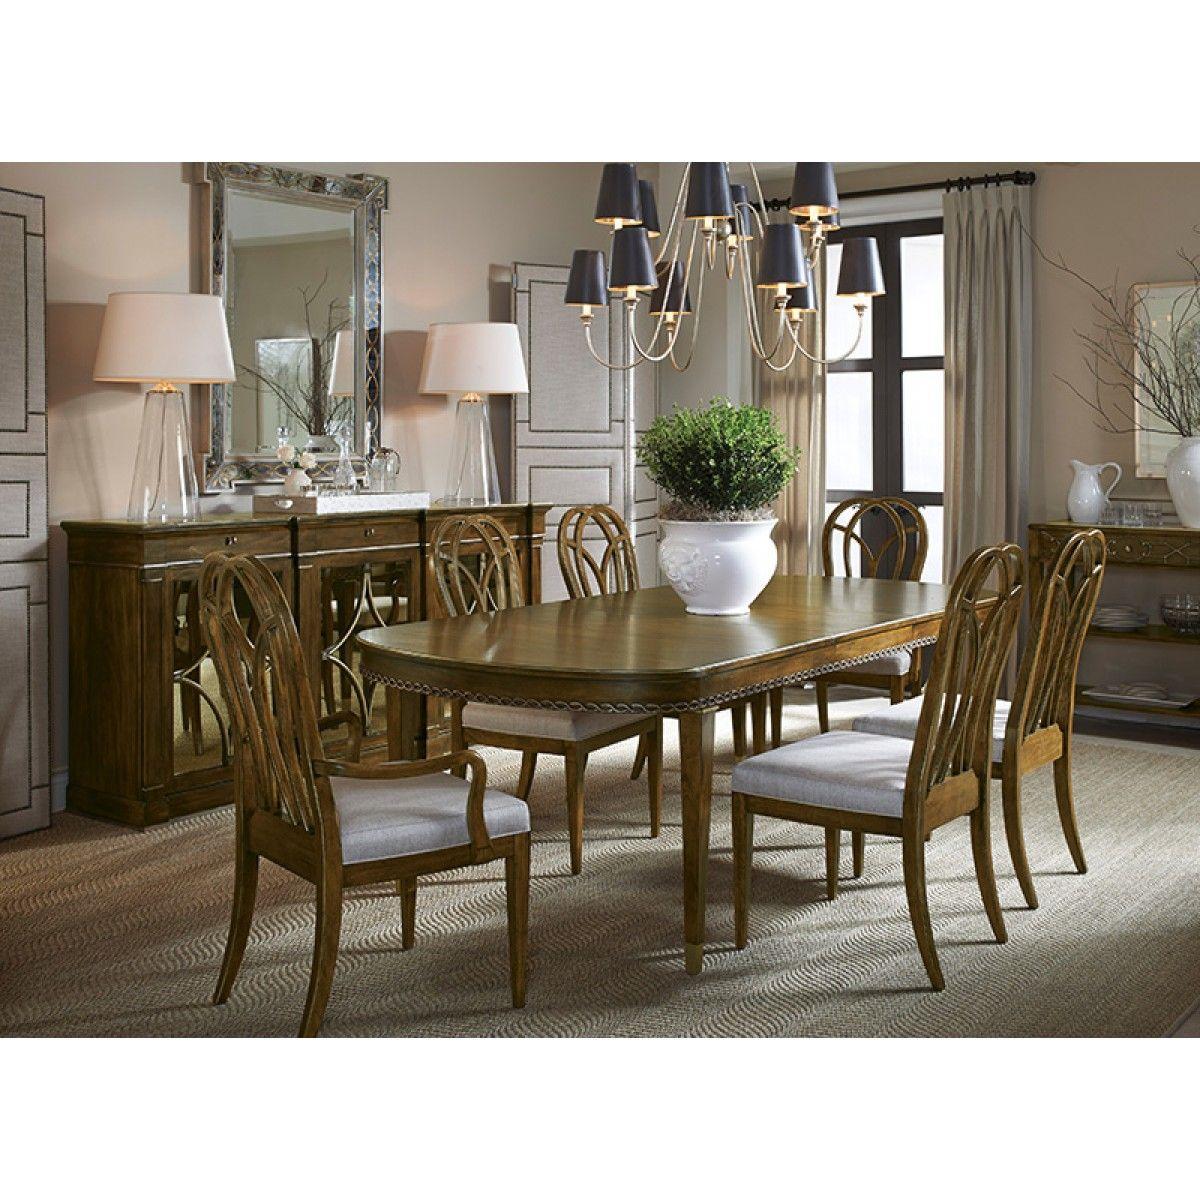 Drexel Heritage Olio Imagination Dining Table  Lake House Design Custom Drexel Heritage Dining Room Design Inspiration